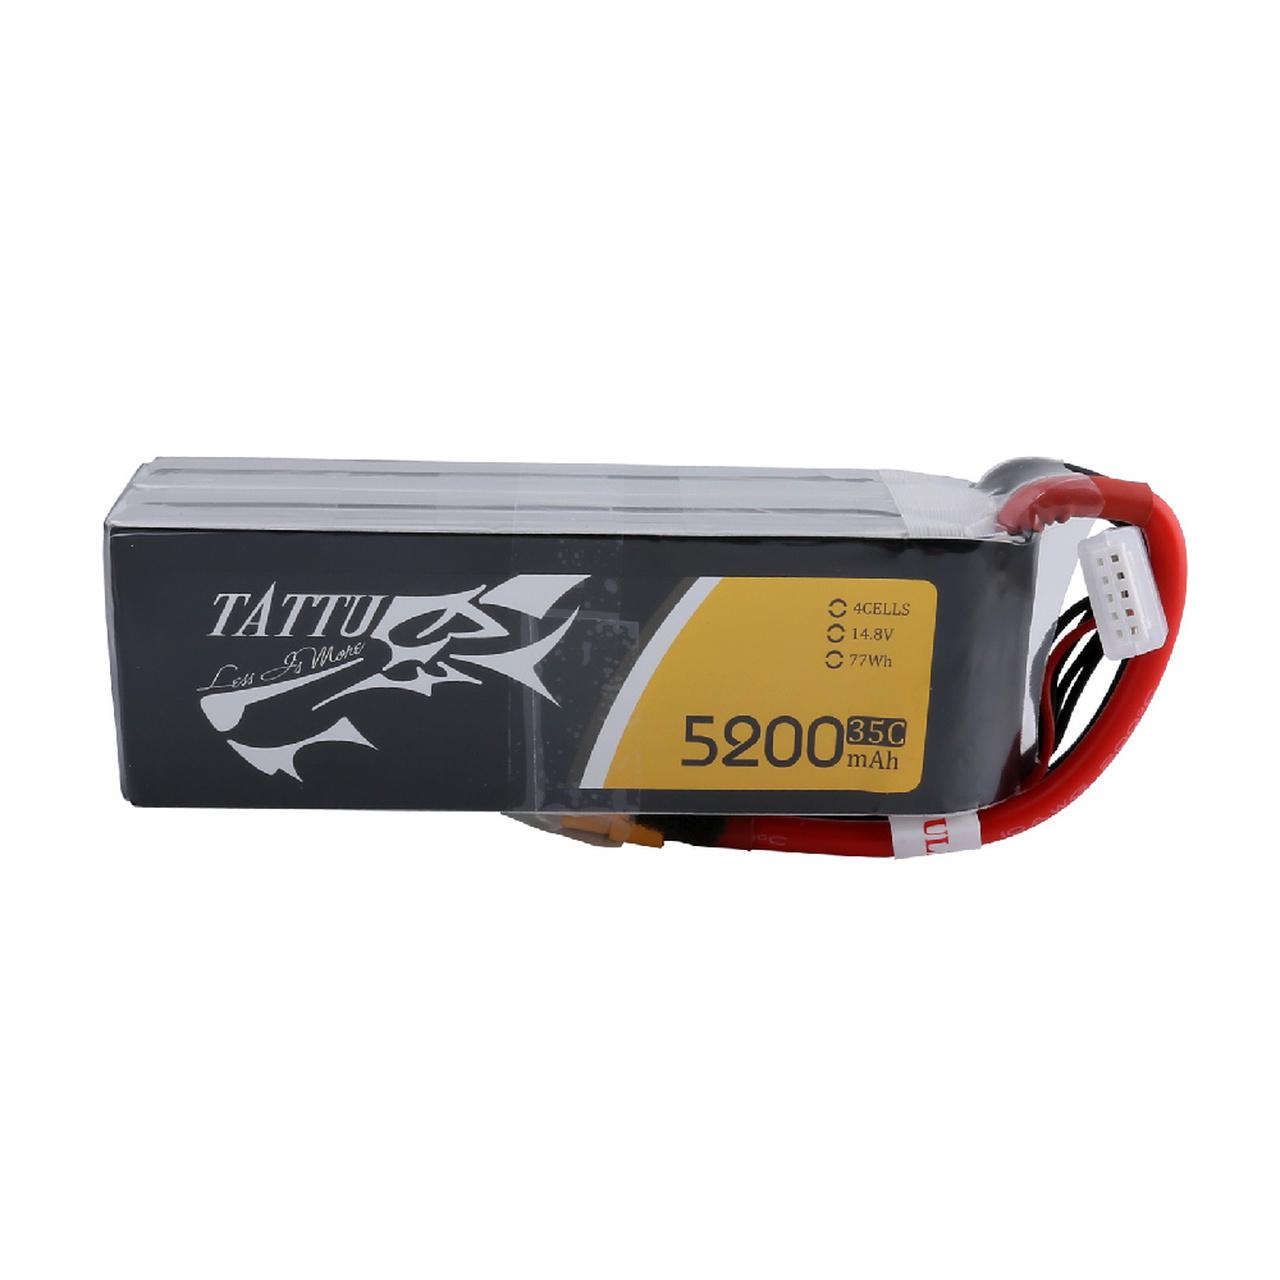 Tattu 5200mAh 14.8V 35C 4S1P Lipo Battery Pack with XT60 Plug